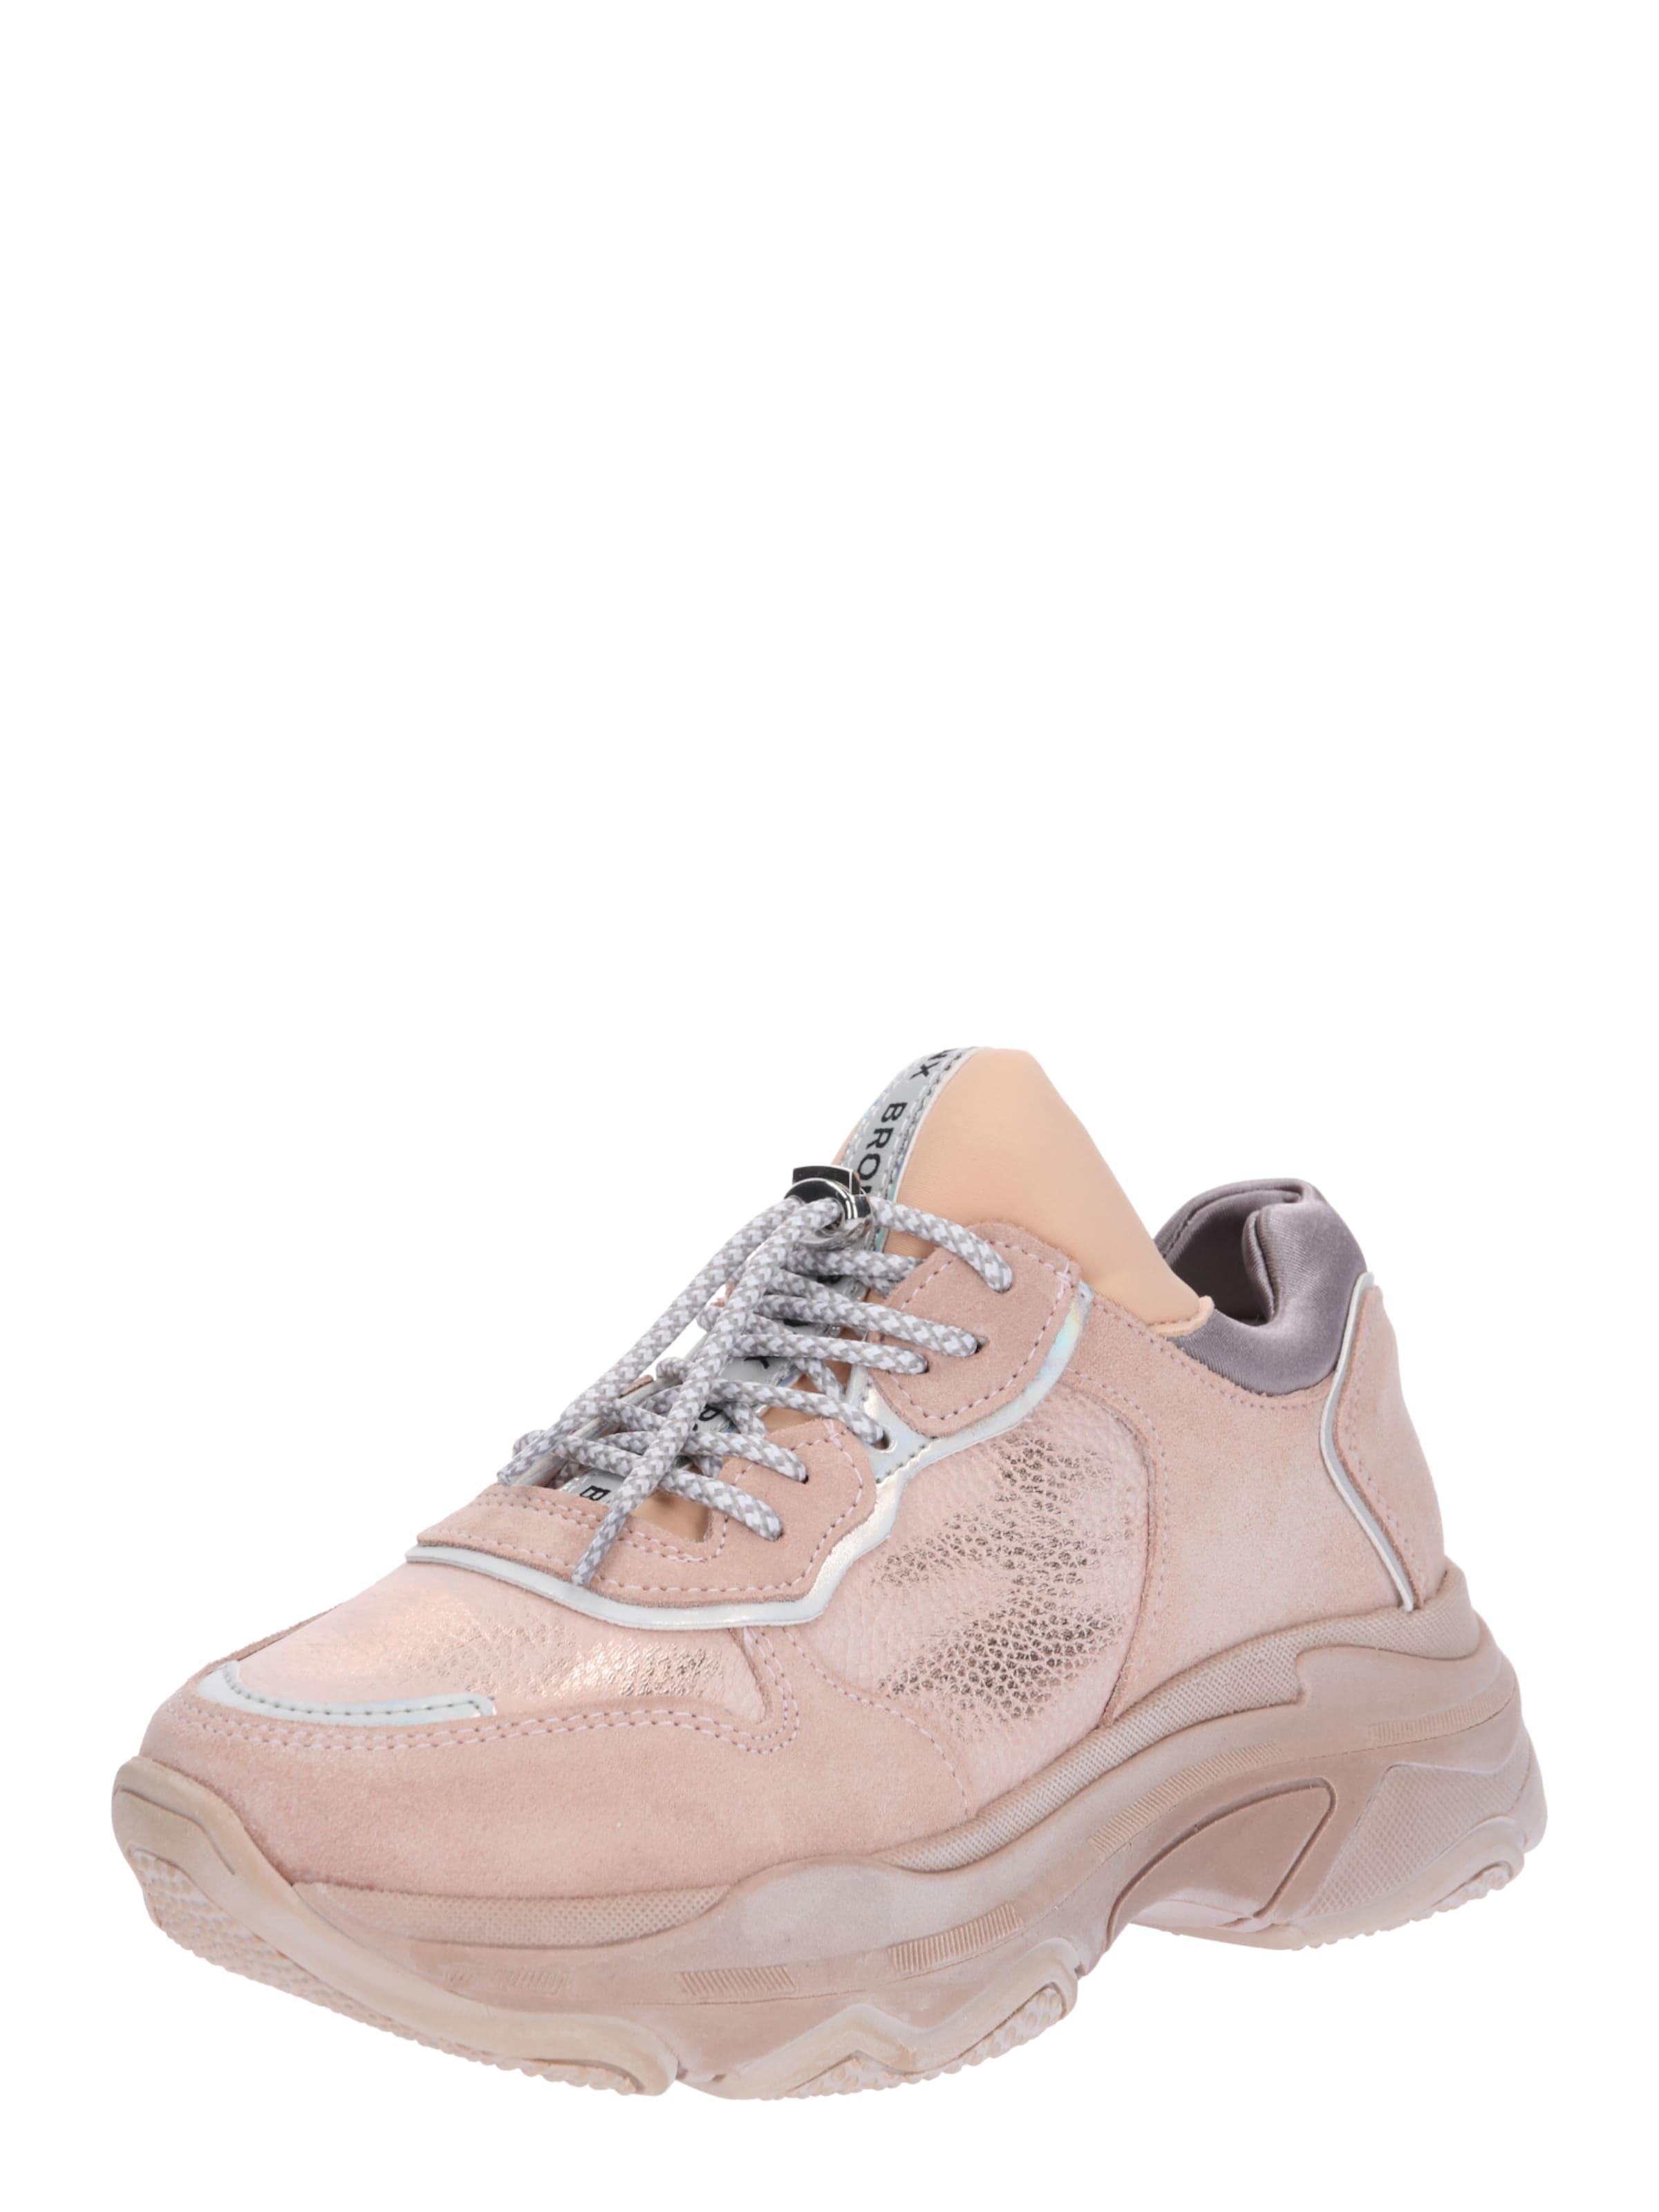 BRONX Sneaker Low Günstige und langlebige Schuhe